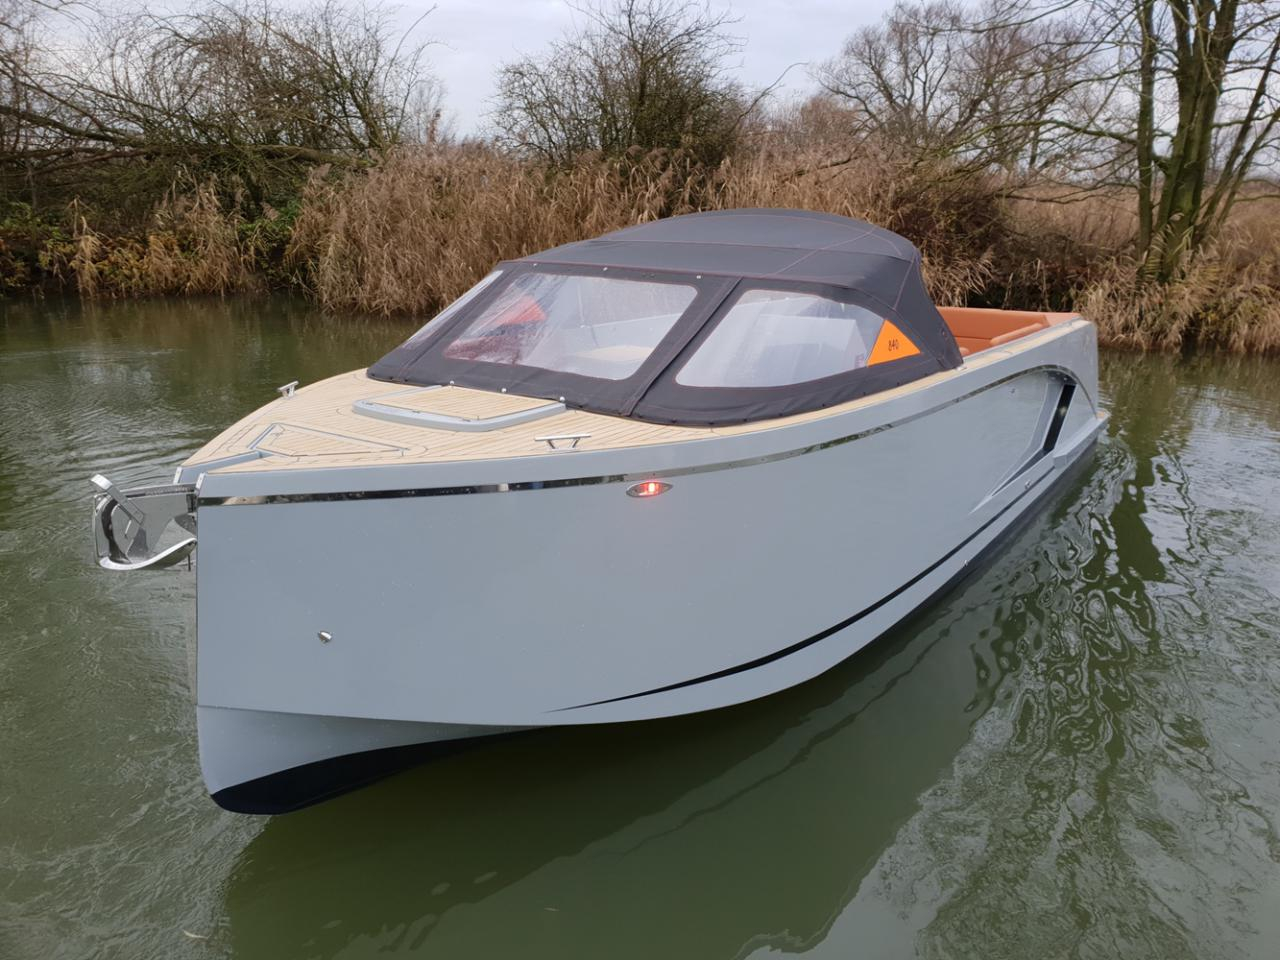 Maxima 840 tender 32